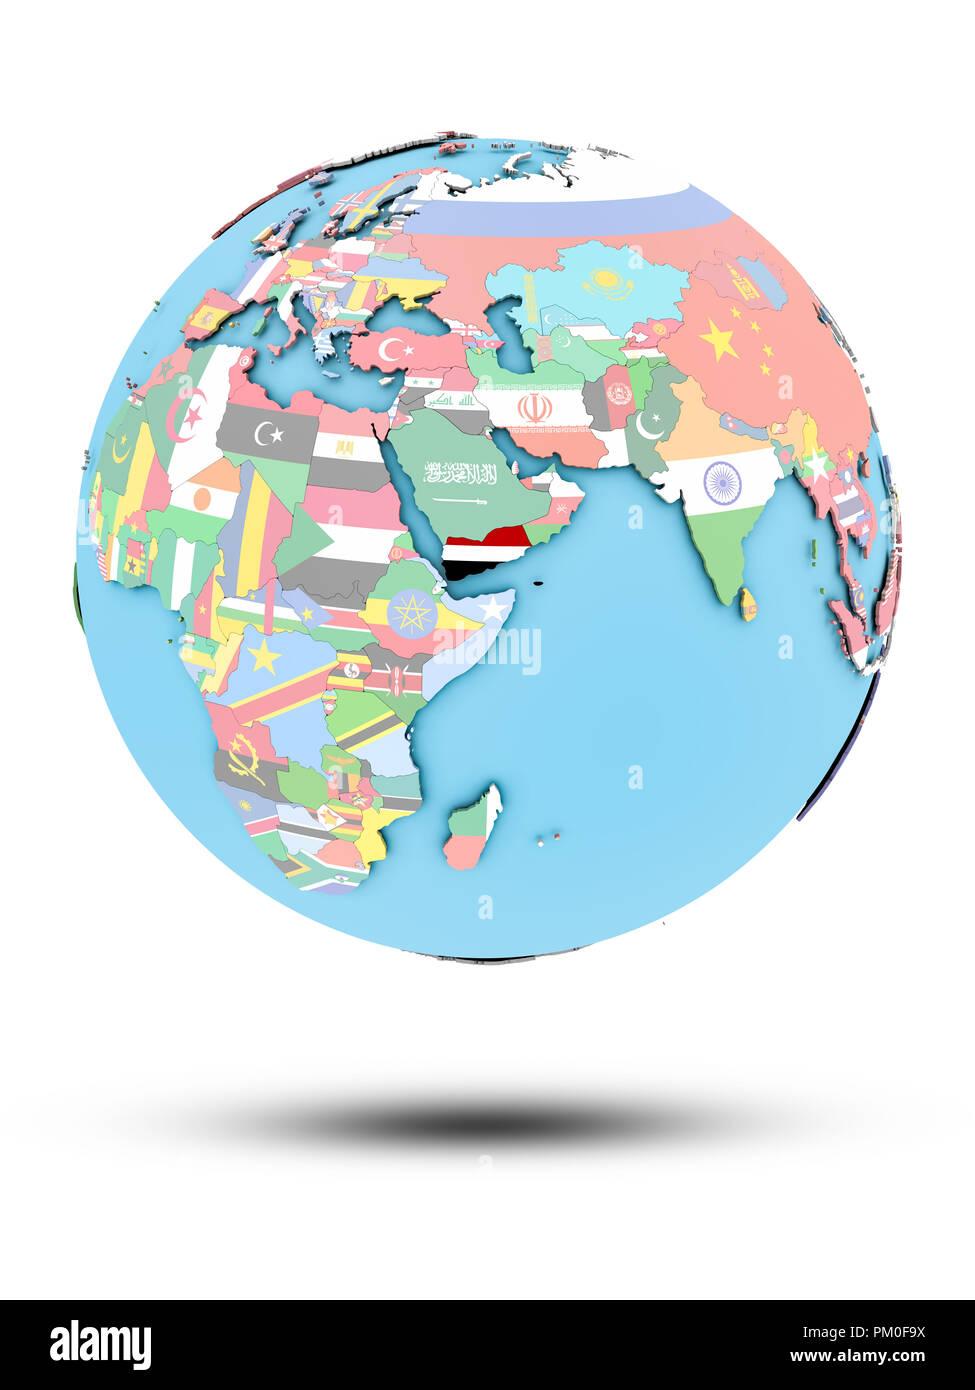 Yemen on political globe with national flags isolated on white background. 3D illustration. - Stock Image